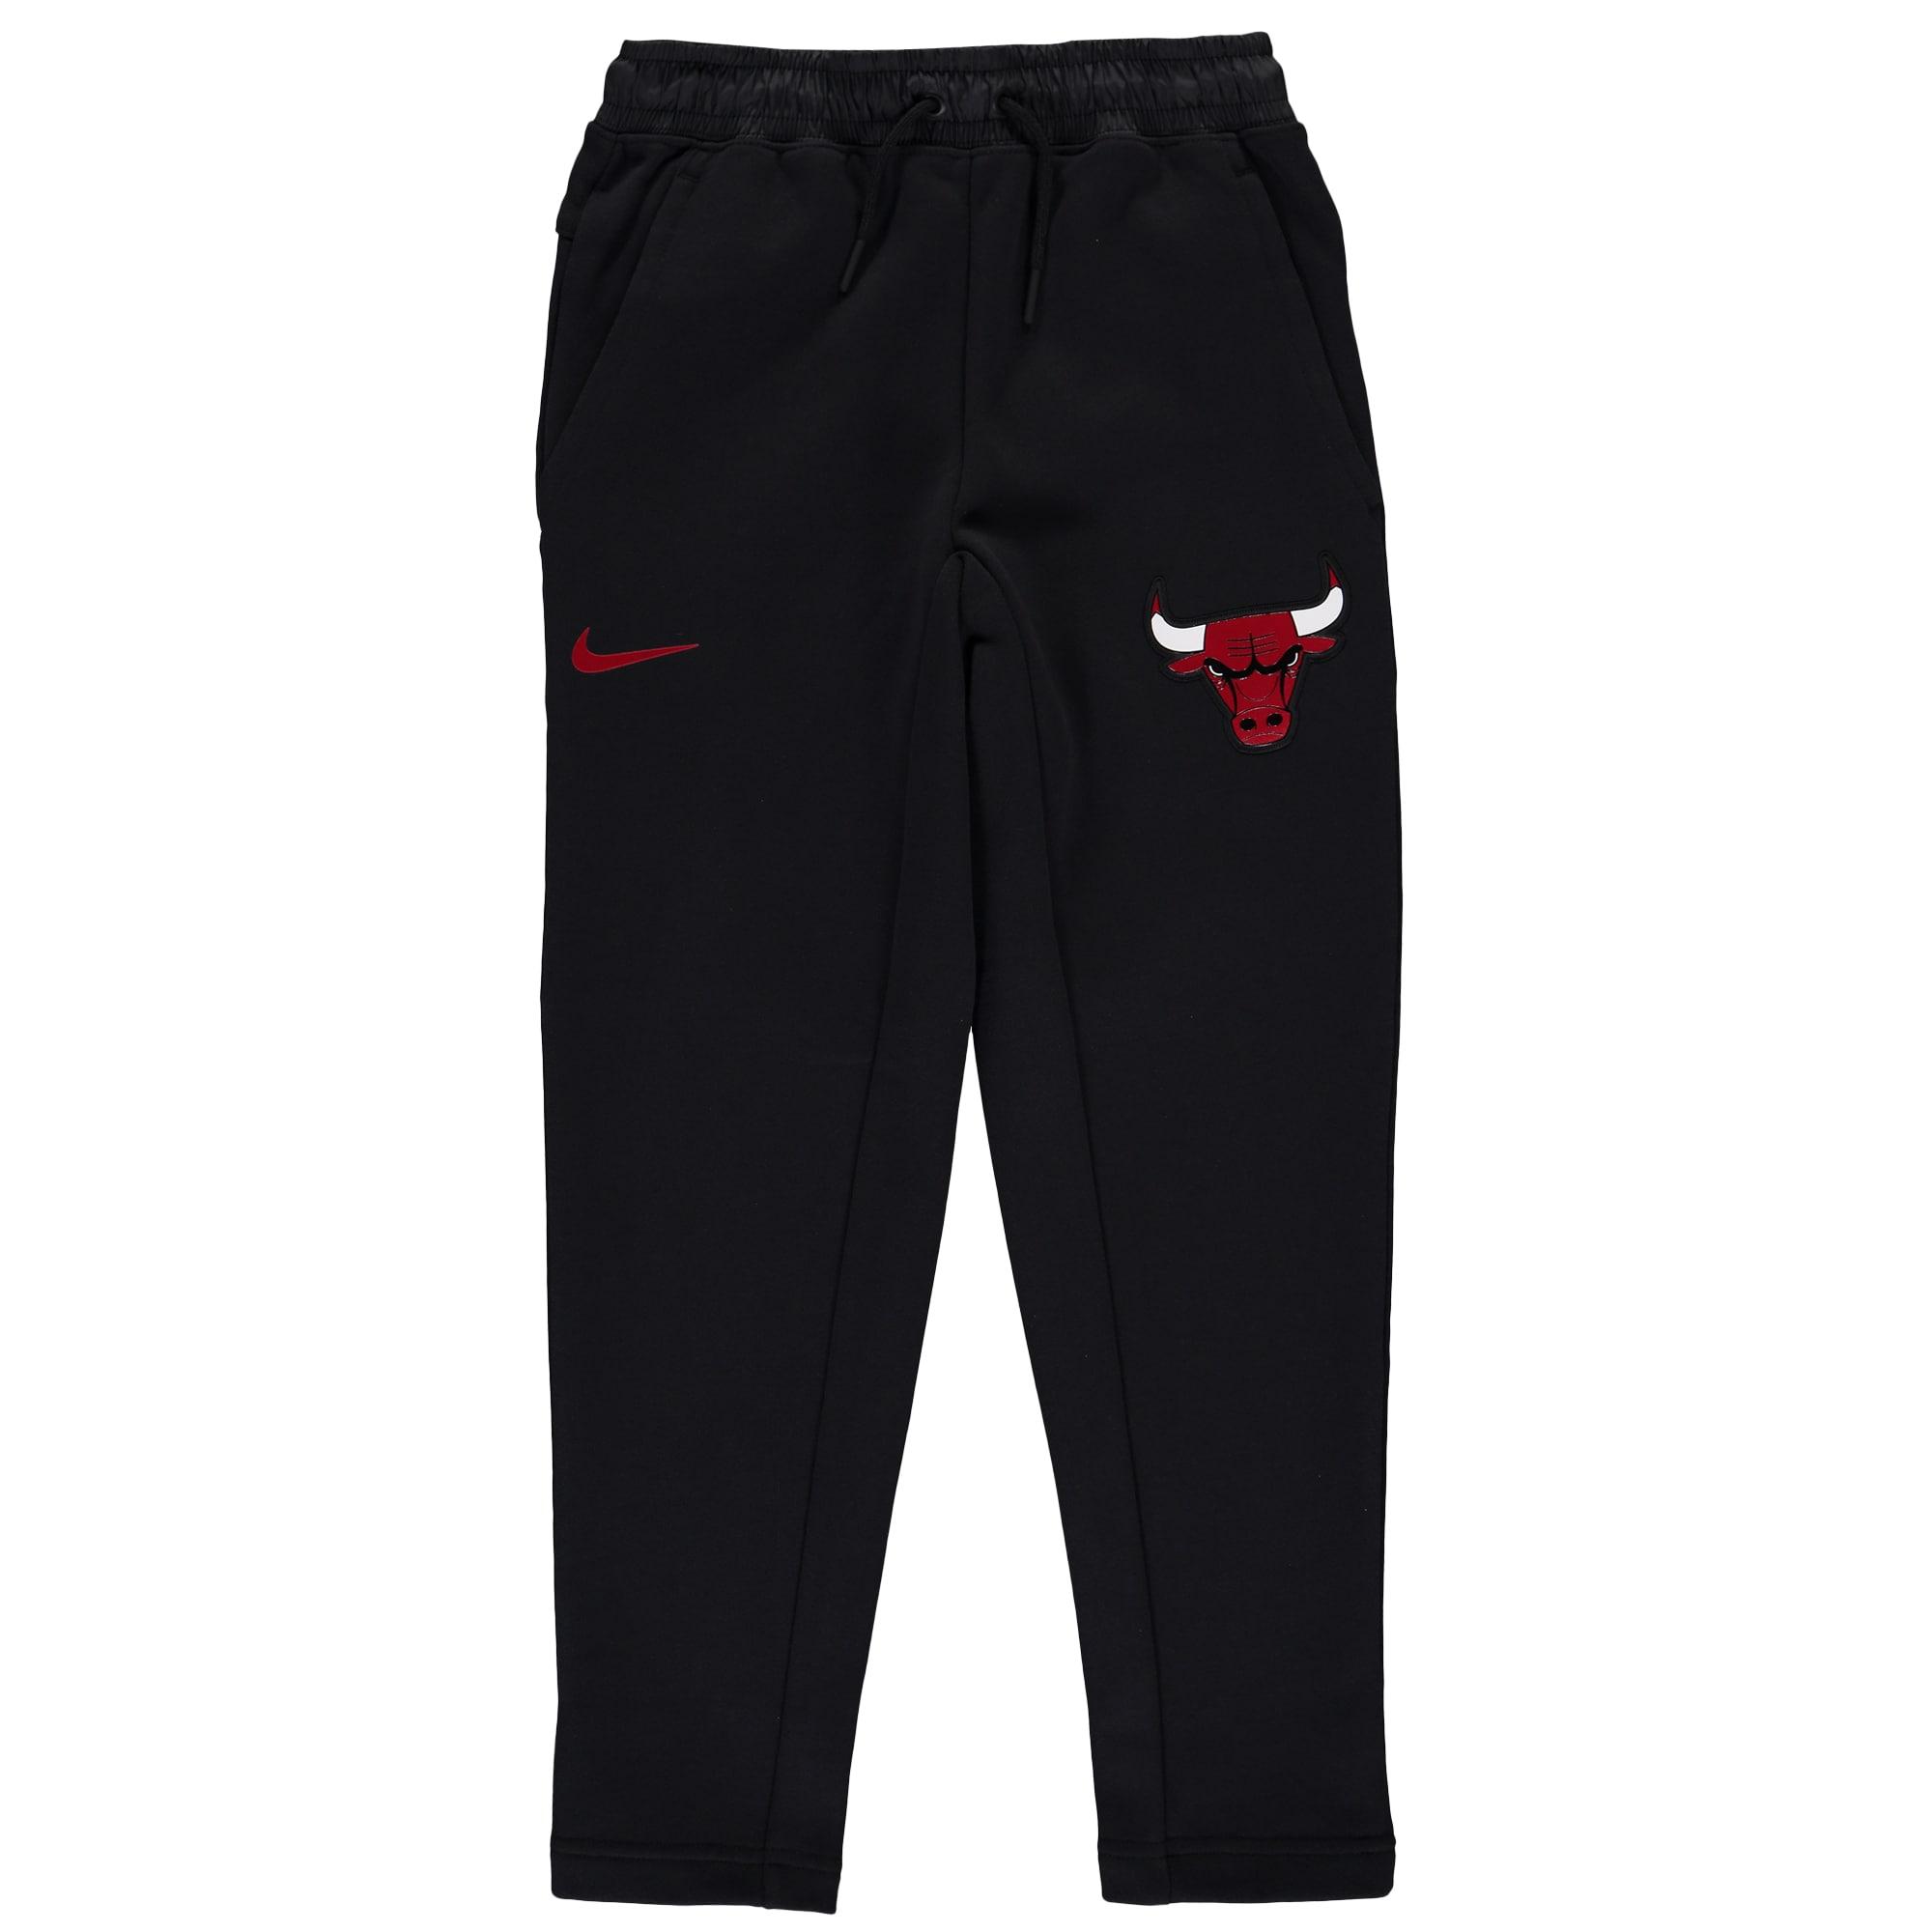 Chicago Bulls Nike Youth Modern Pants - Black